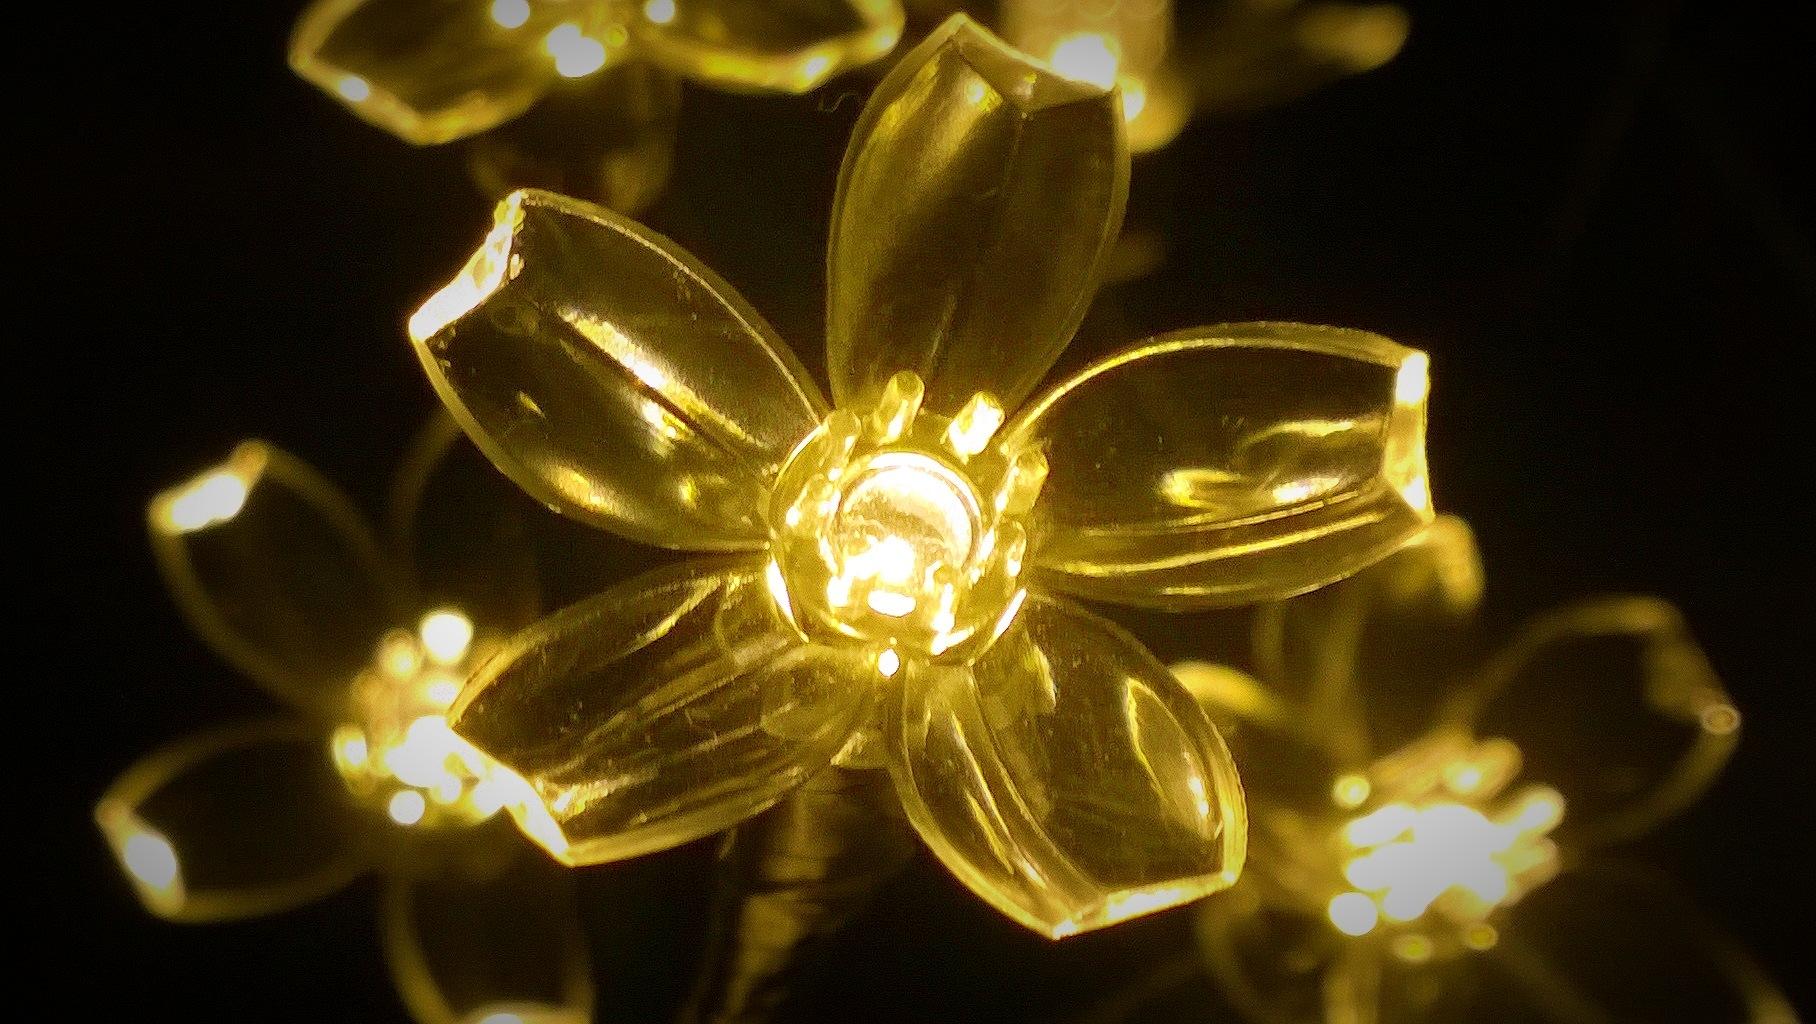 xmas light by Terry Dunn